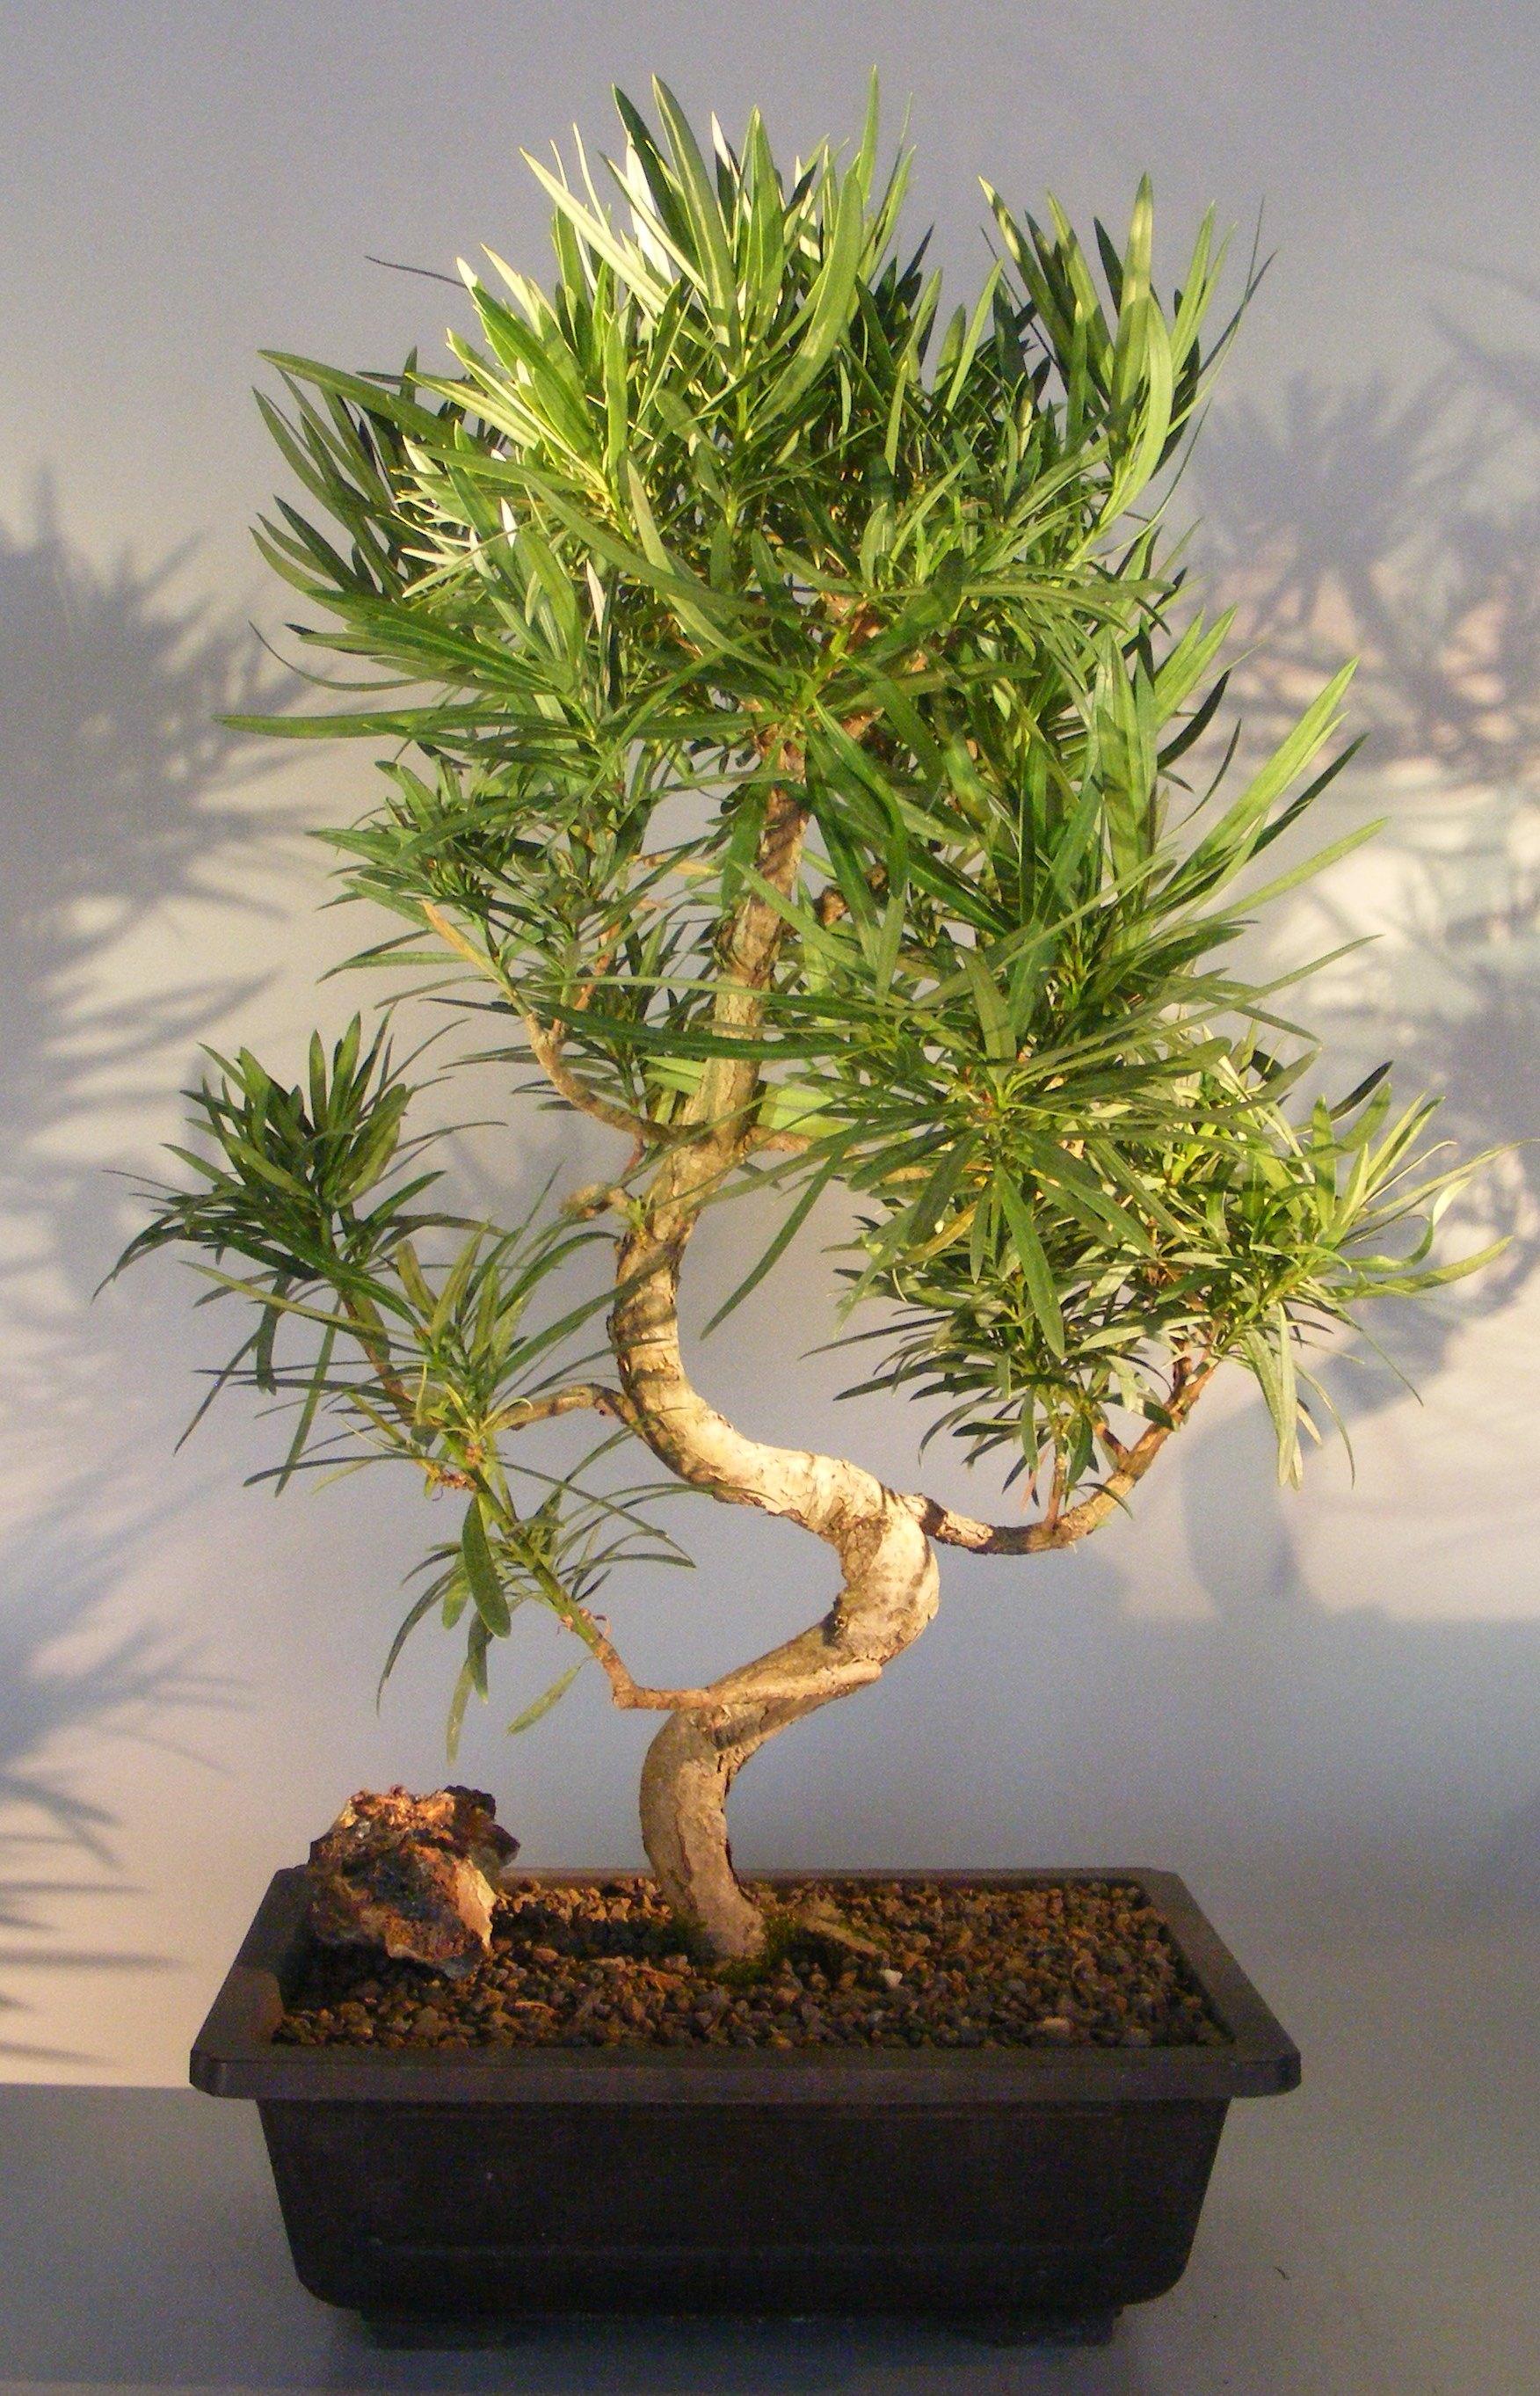 Flowering Podocarpus Bonsai Tree Curved Trunk Style Podocarpus Macrophyllus